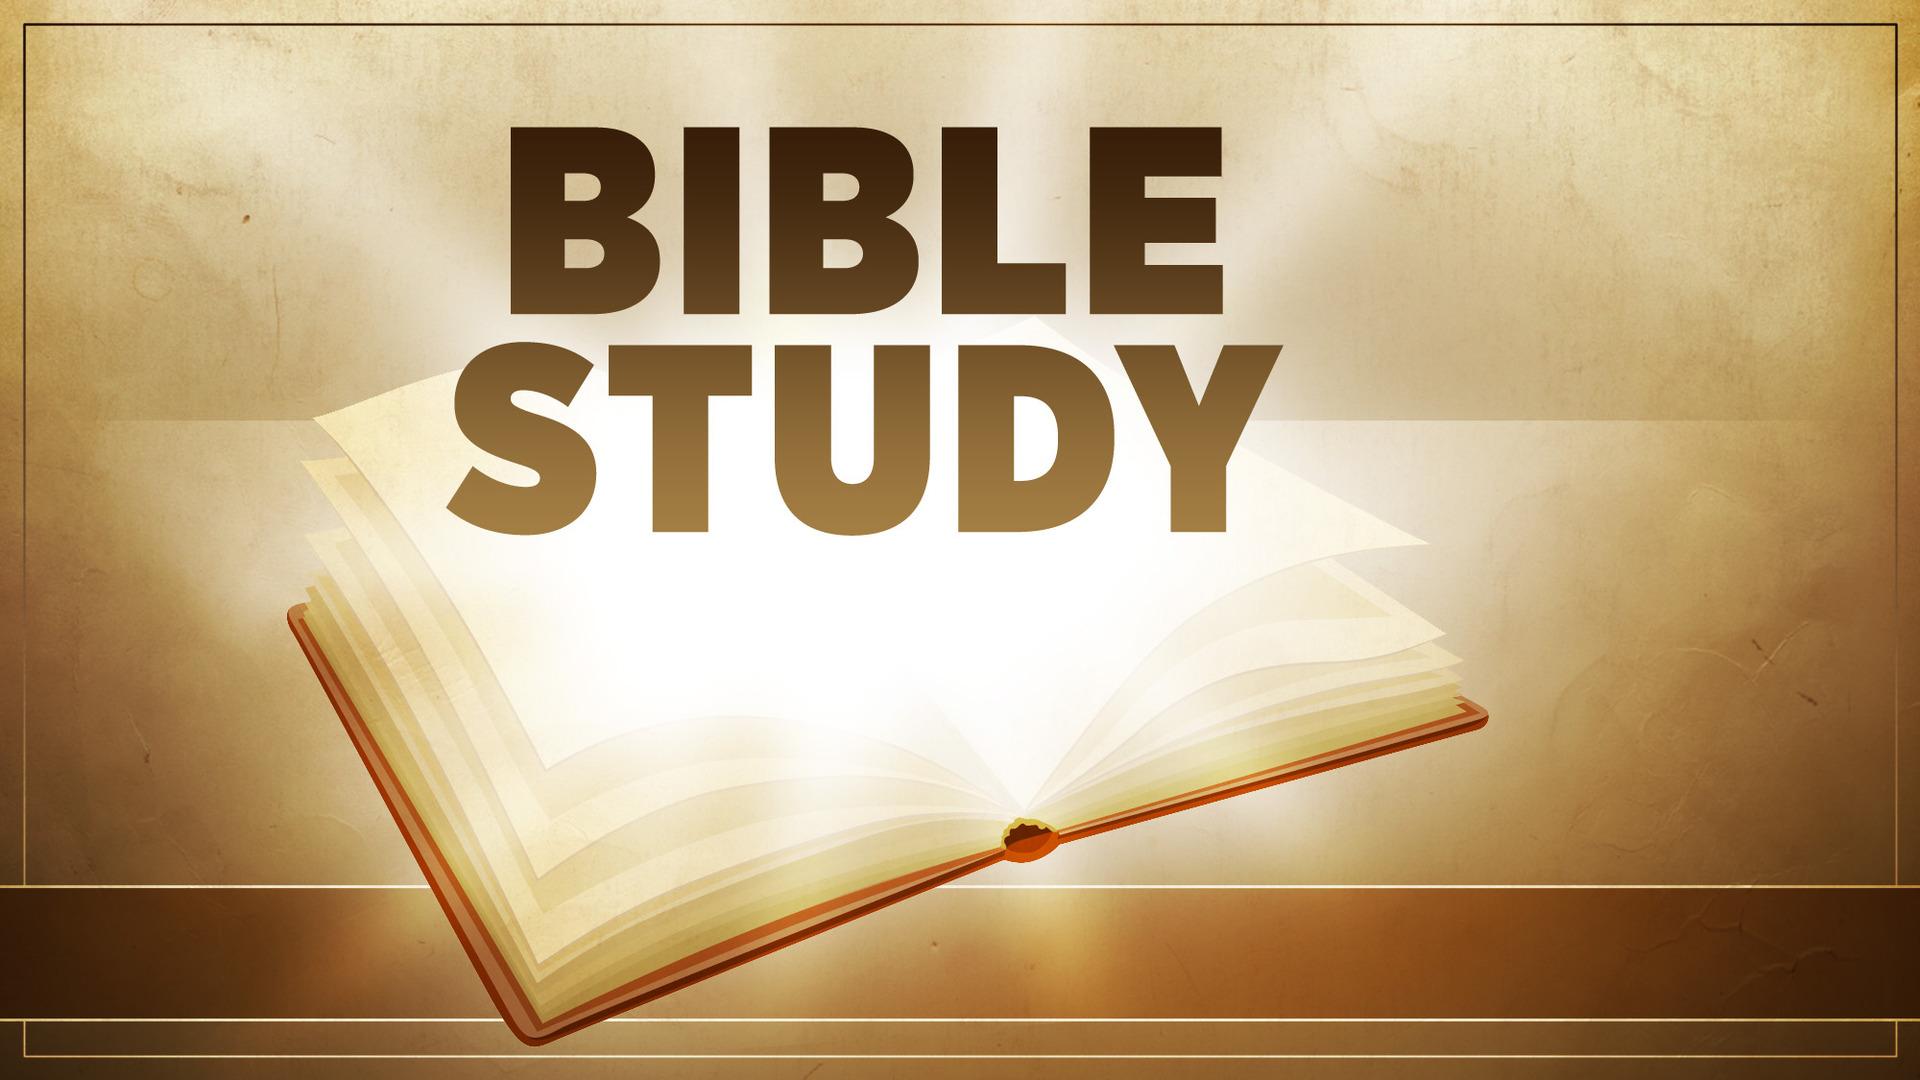 bible_study-title-2-still-16x9.jpg